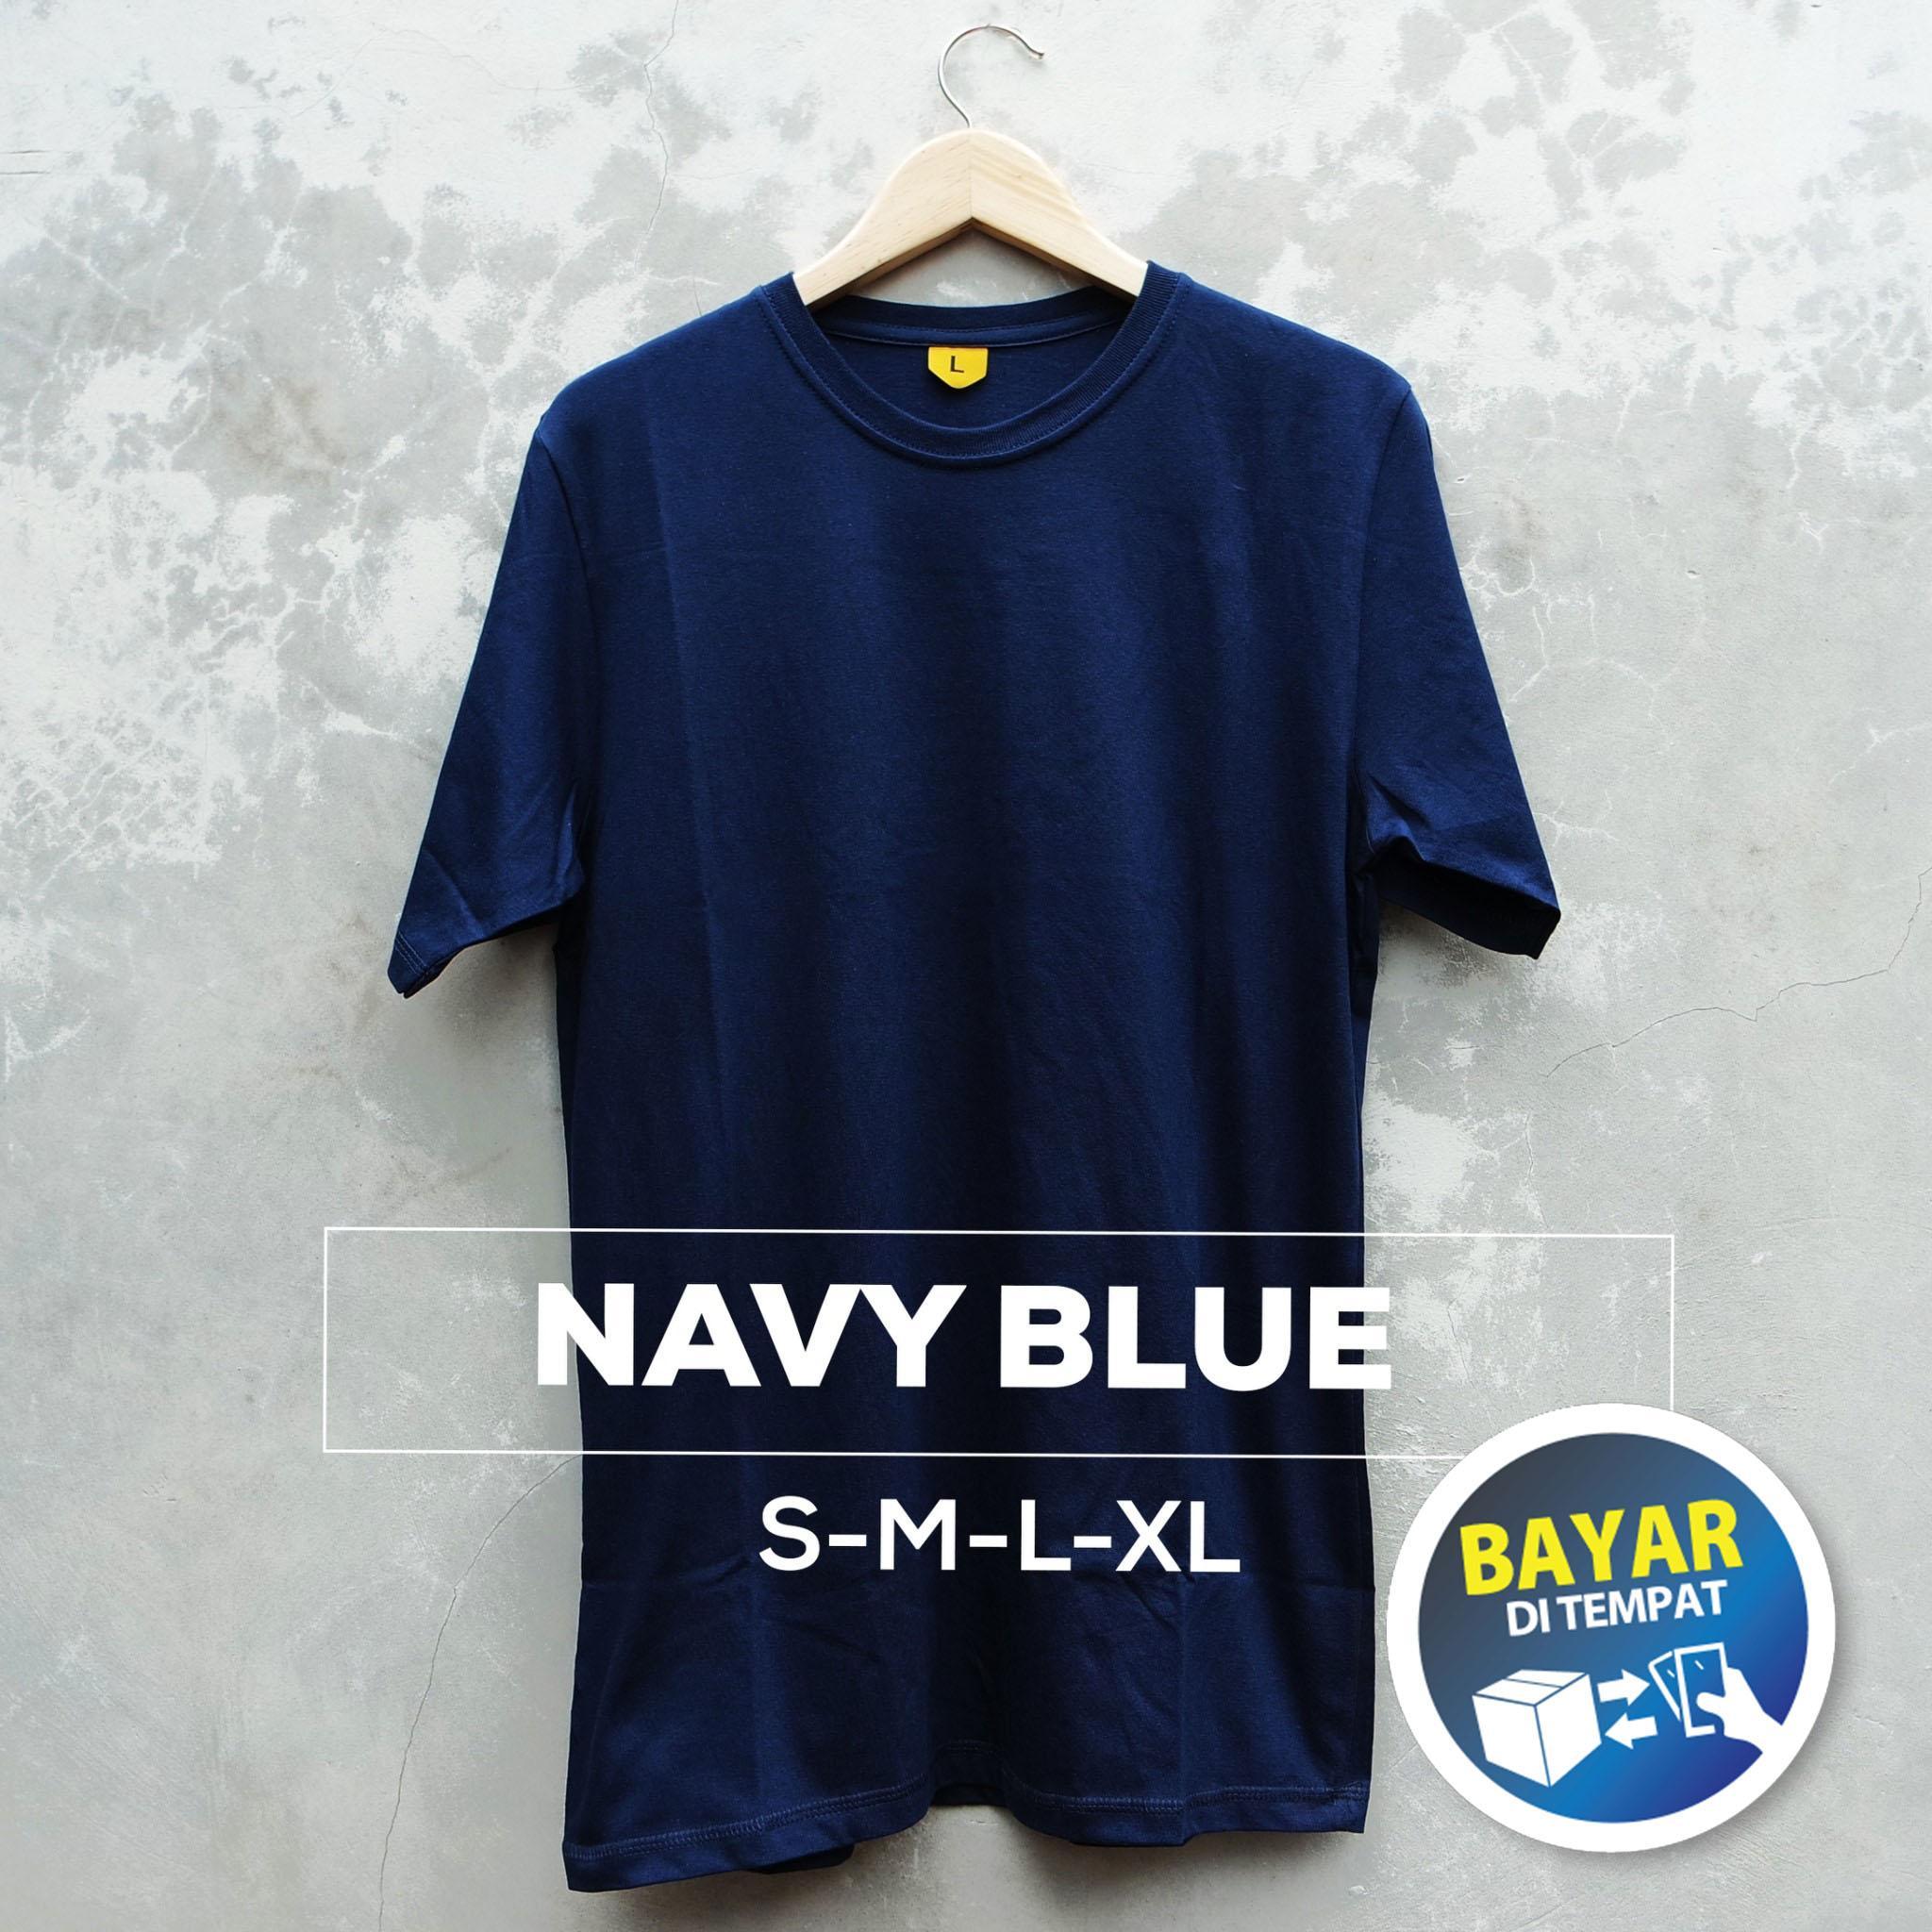 Baju Kaos Polos Lengan Pendek Biru Dongker Cewek Cowok Blue Navy Unisex Lazada Indonesia